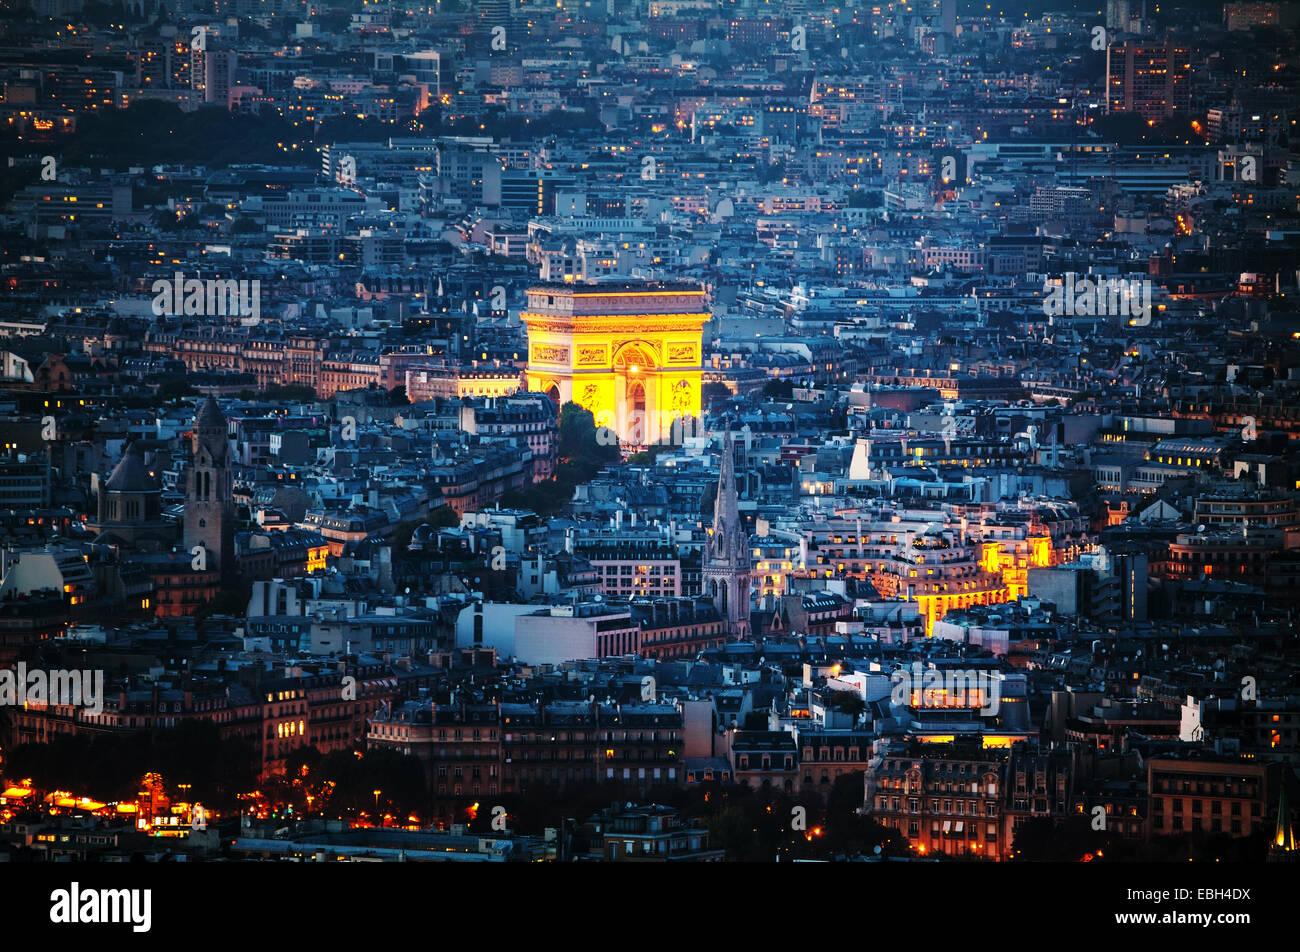 Aerial view of Arc de Triomphe de l'Etoile (The Triumphal Arch) in Paris at night - Stock Image